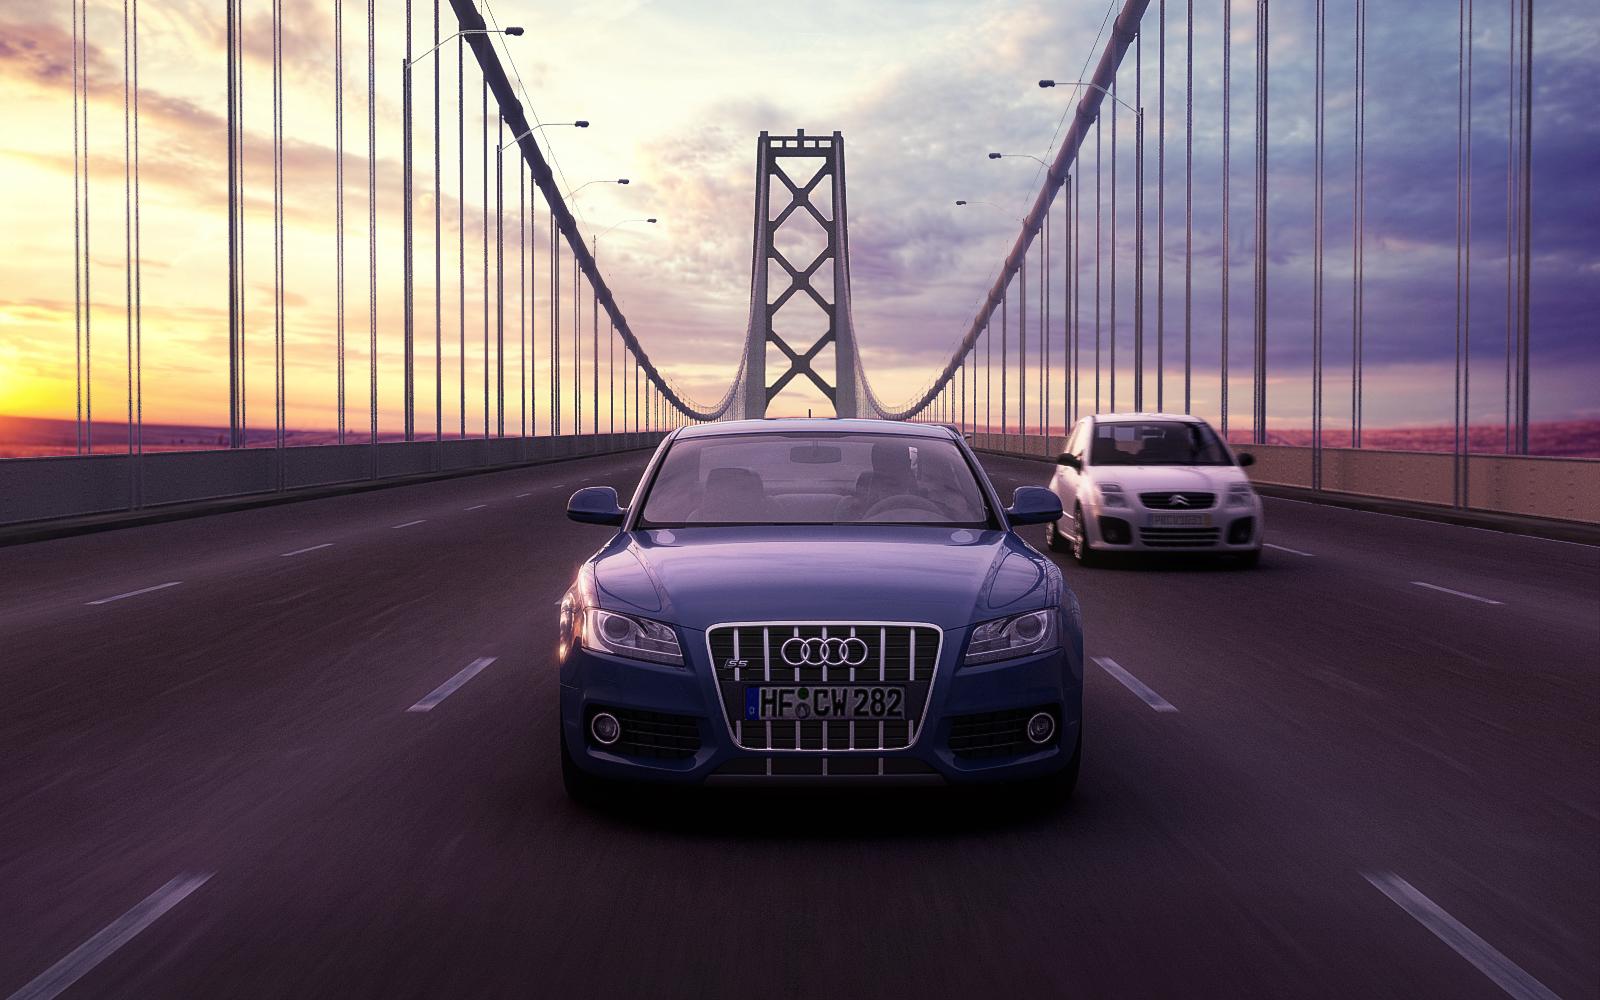 Audi USA via Azeez Bakare Studios